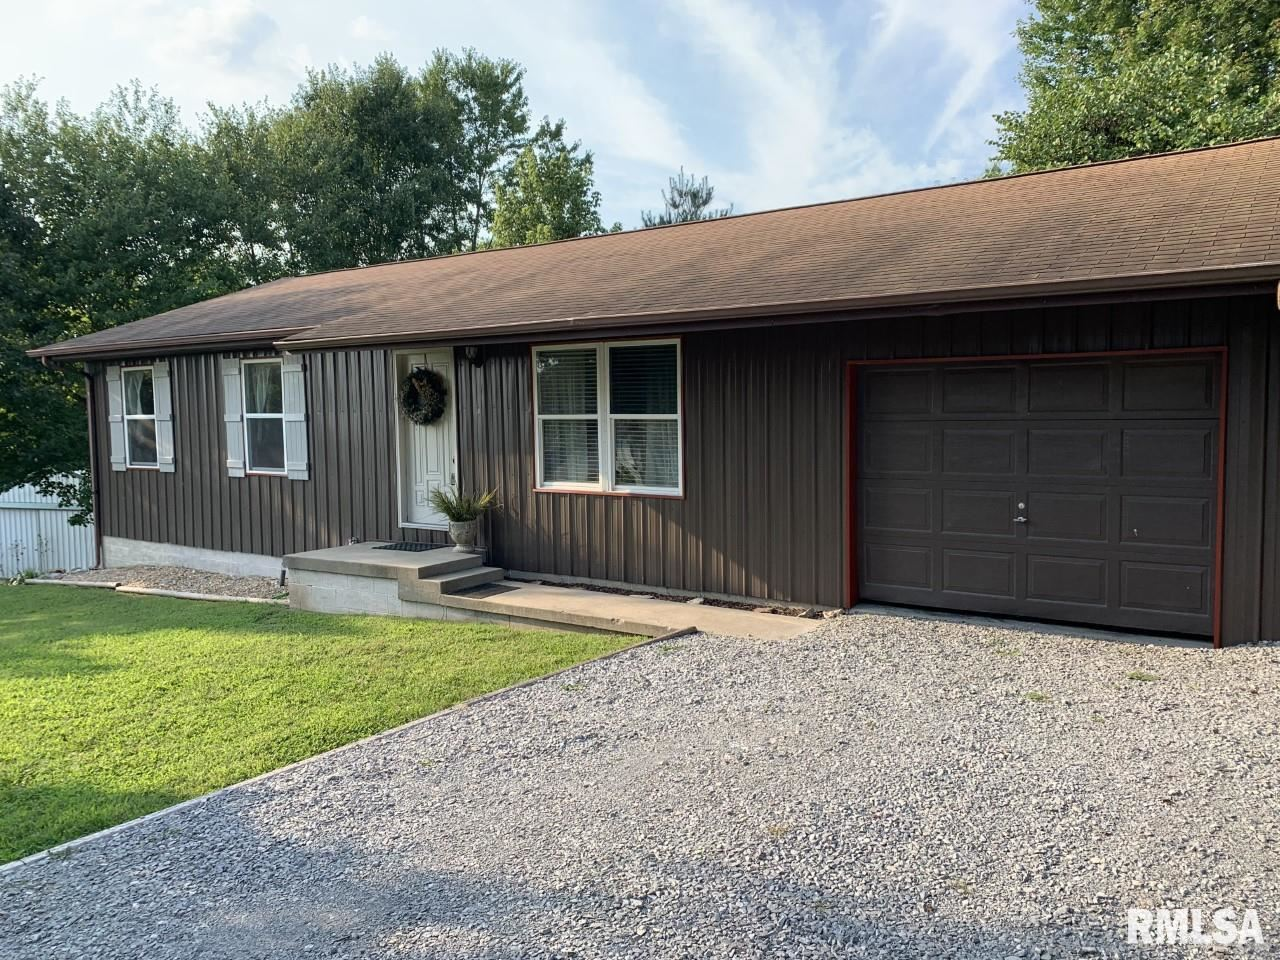 106 VIRGINIA Drive, Jonesboro, IL 62952-0000 - MLS#: EB436106